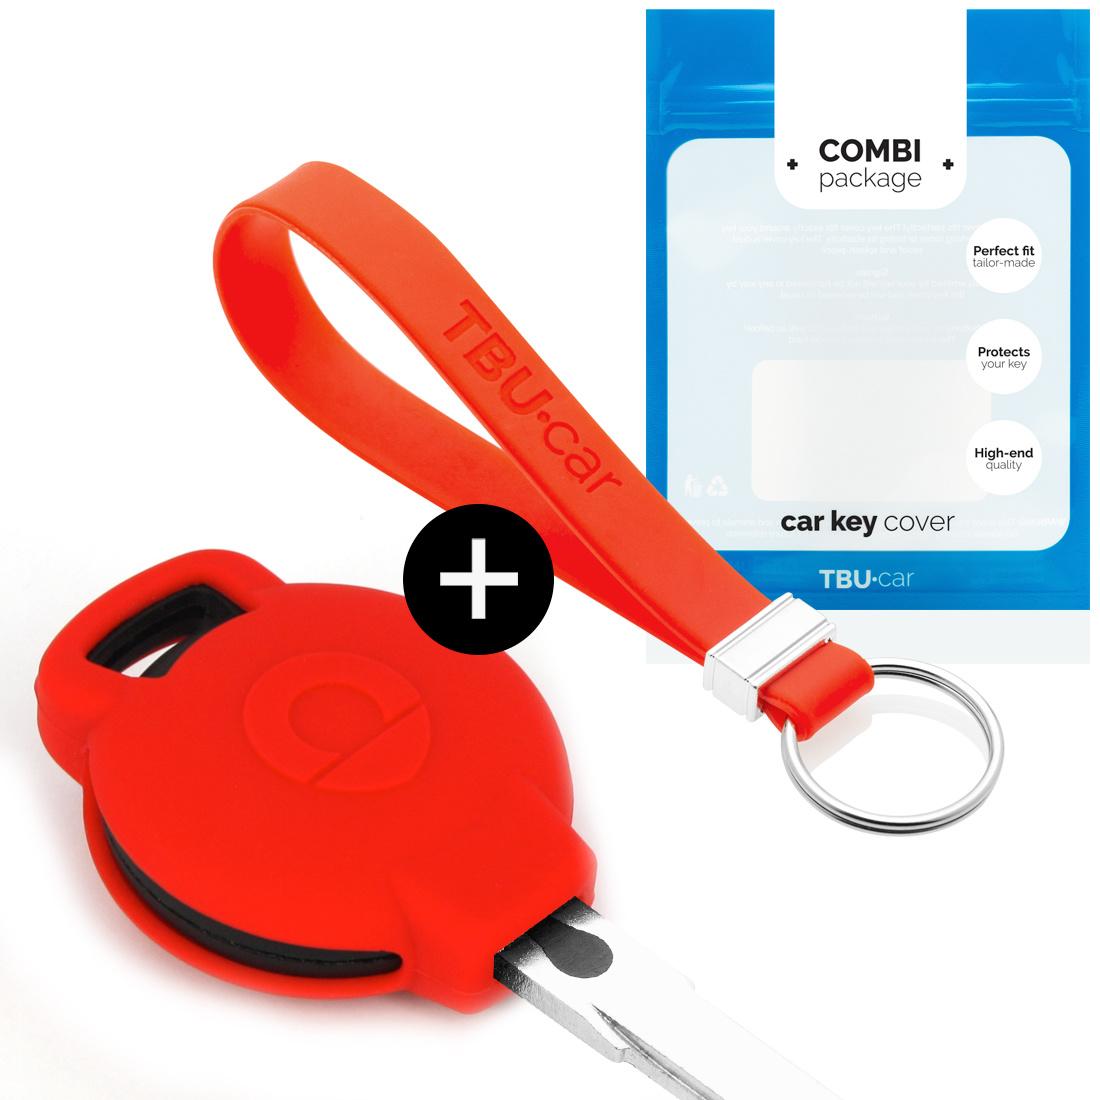 TBU car TBU car Autoschlüssel Hülle kompatibel mit Smart 3 Tasten - Schutzhülle aus Silikon - Auto Schlüsselhülle Cover in Rot